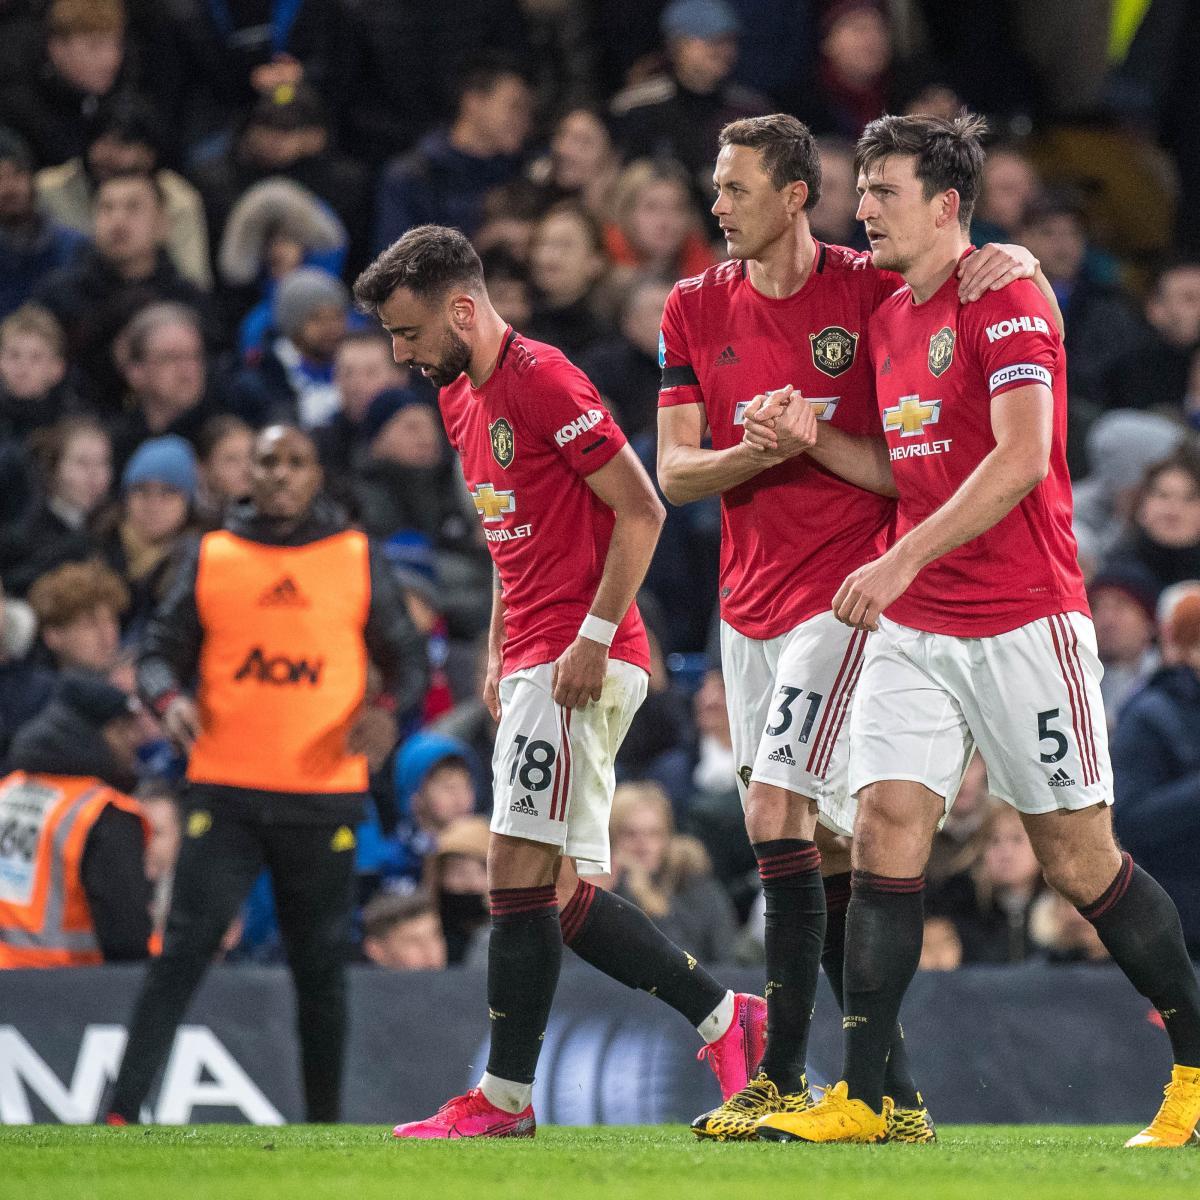 club brugge vs man united - photo #15